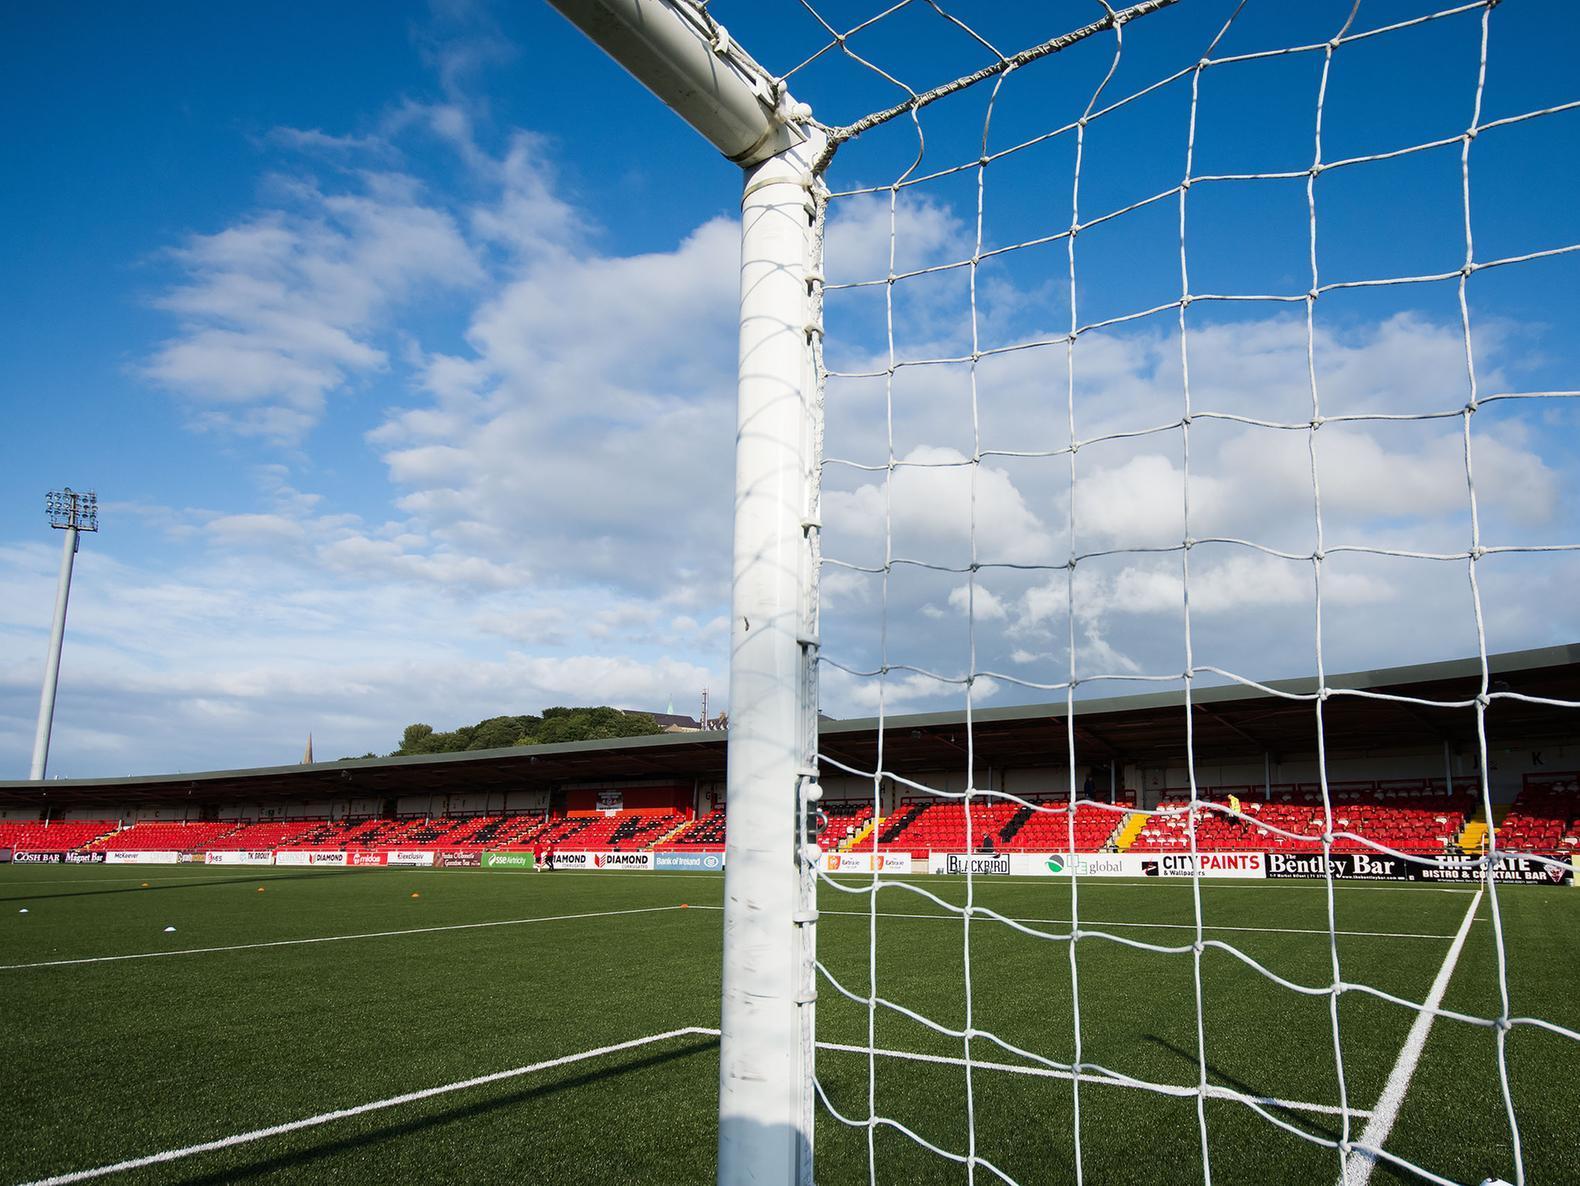 Derry City postpone Sligo Rovers clash after Taoiseach announces mass gathering ban